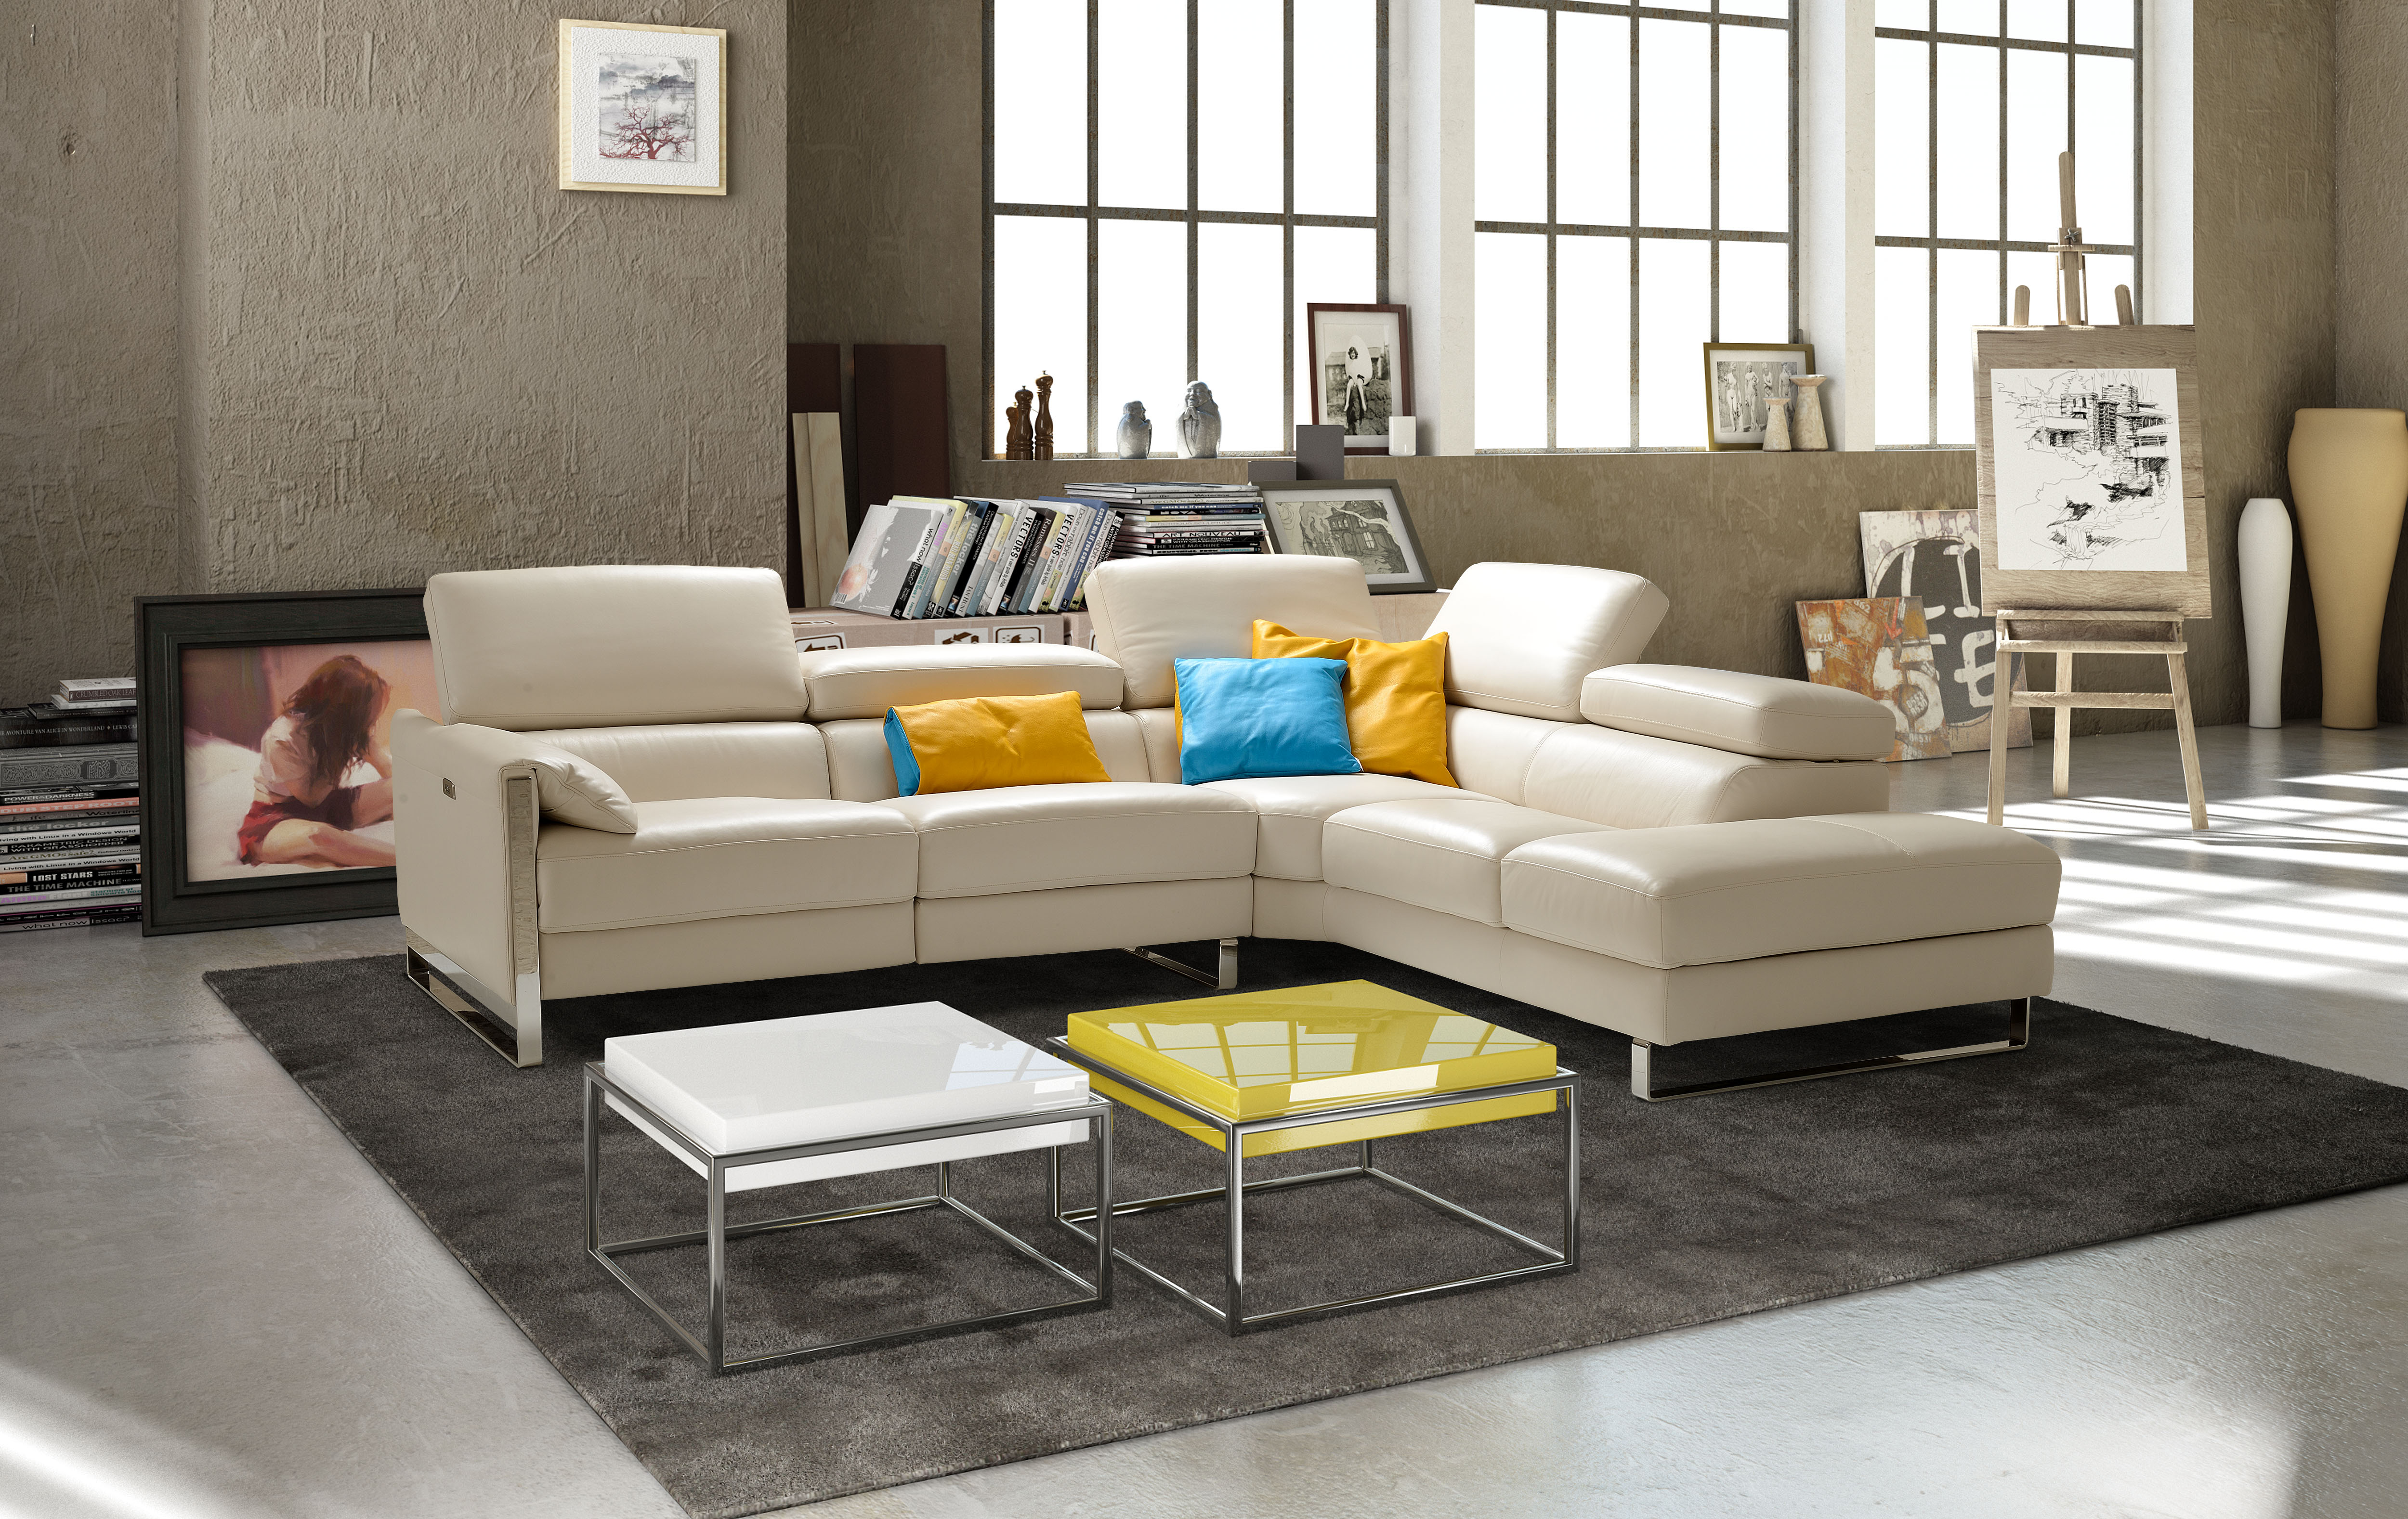 Sophisticated Modern Leather L-shape Sectional Durham North Carolina ...